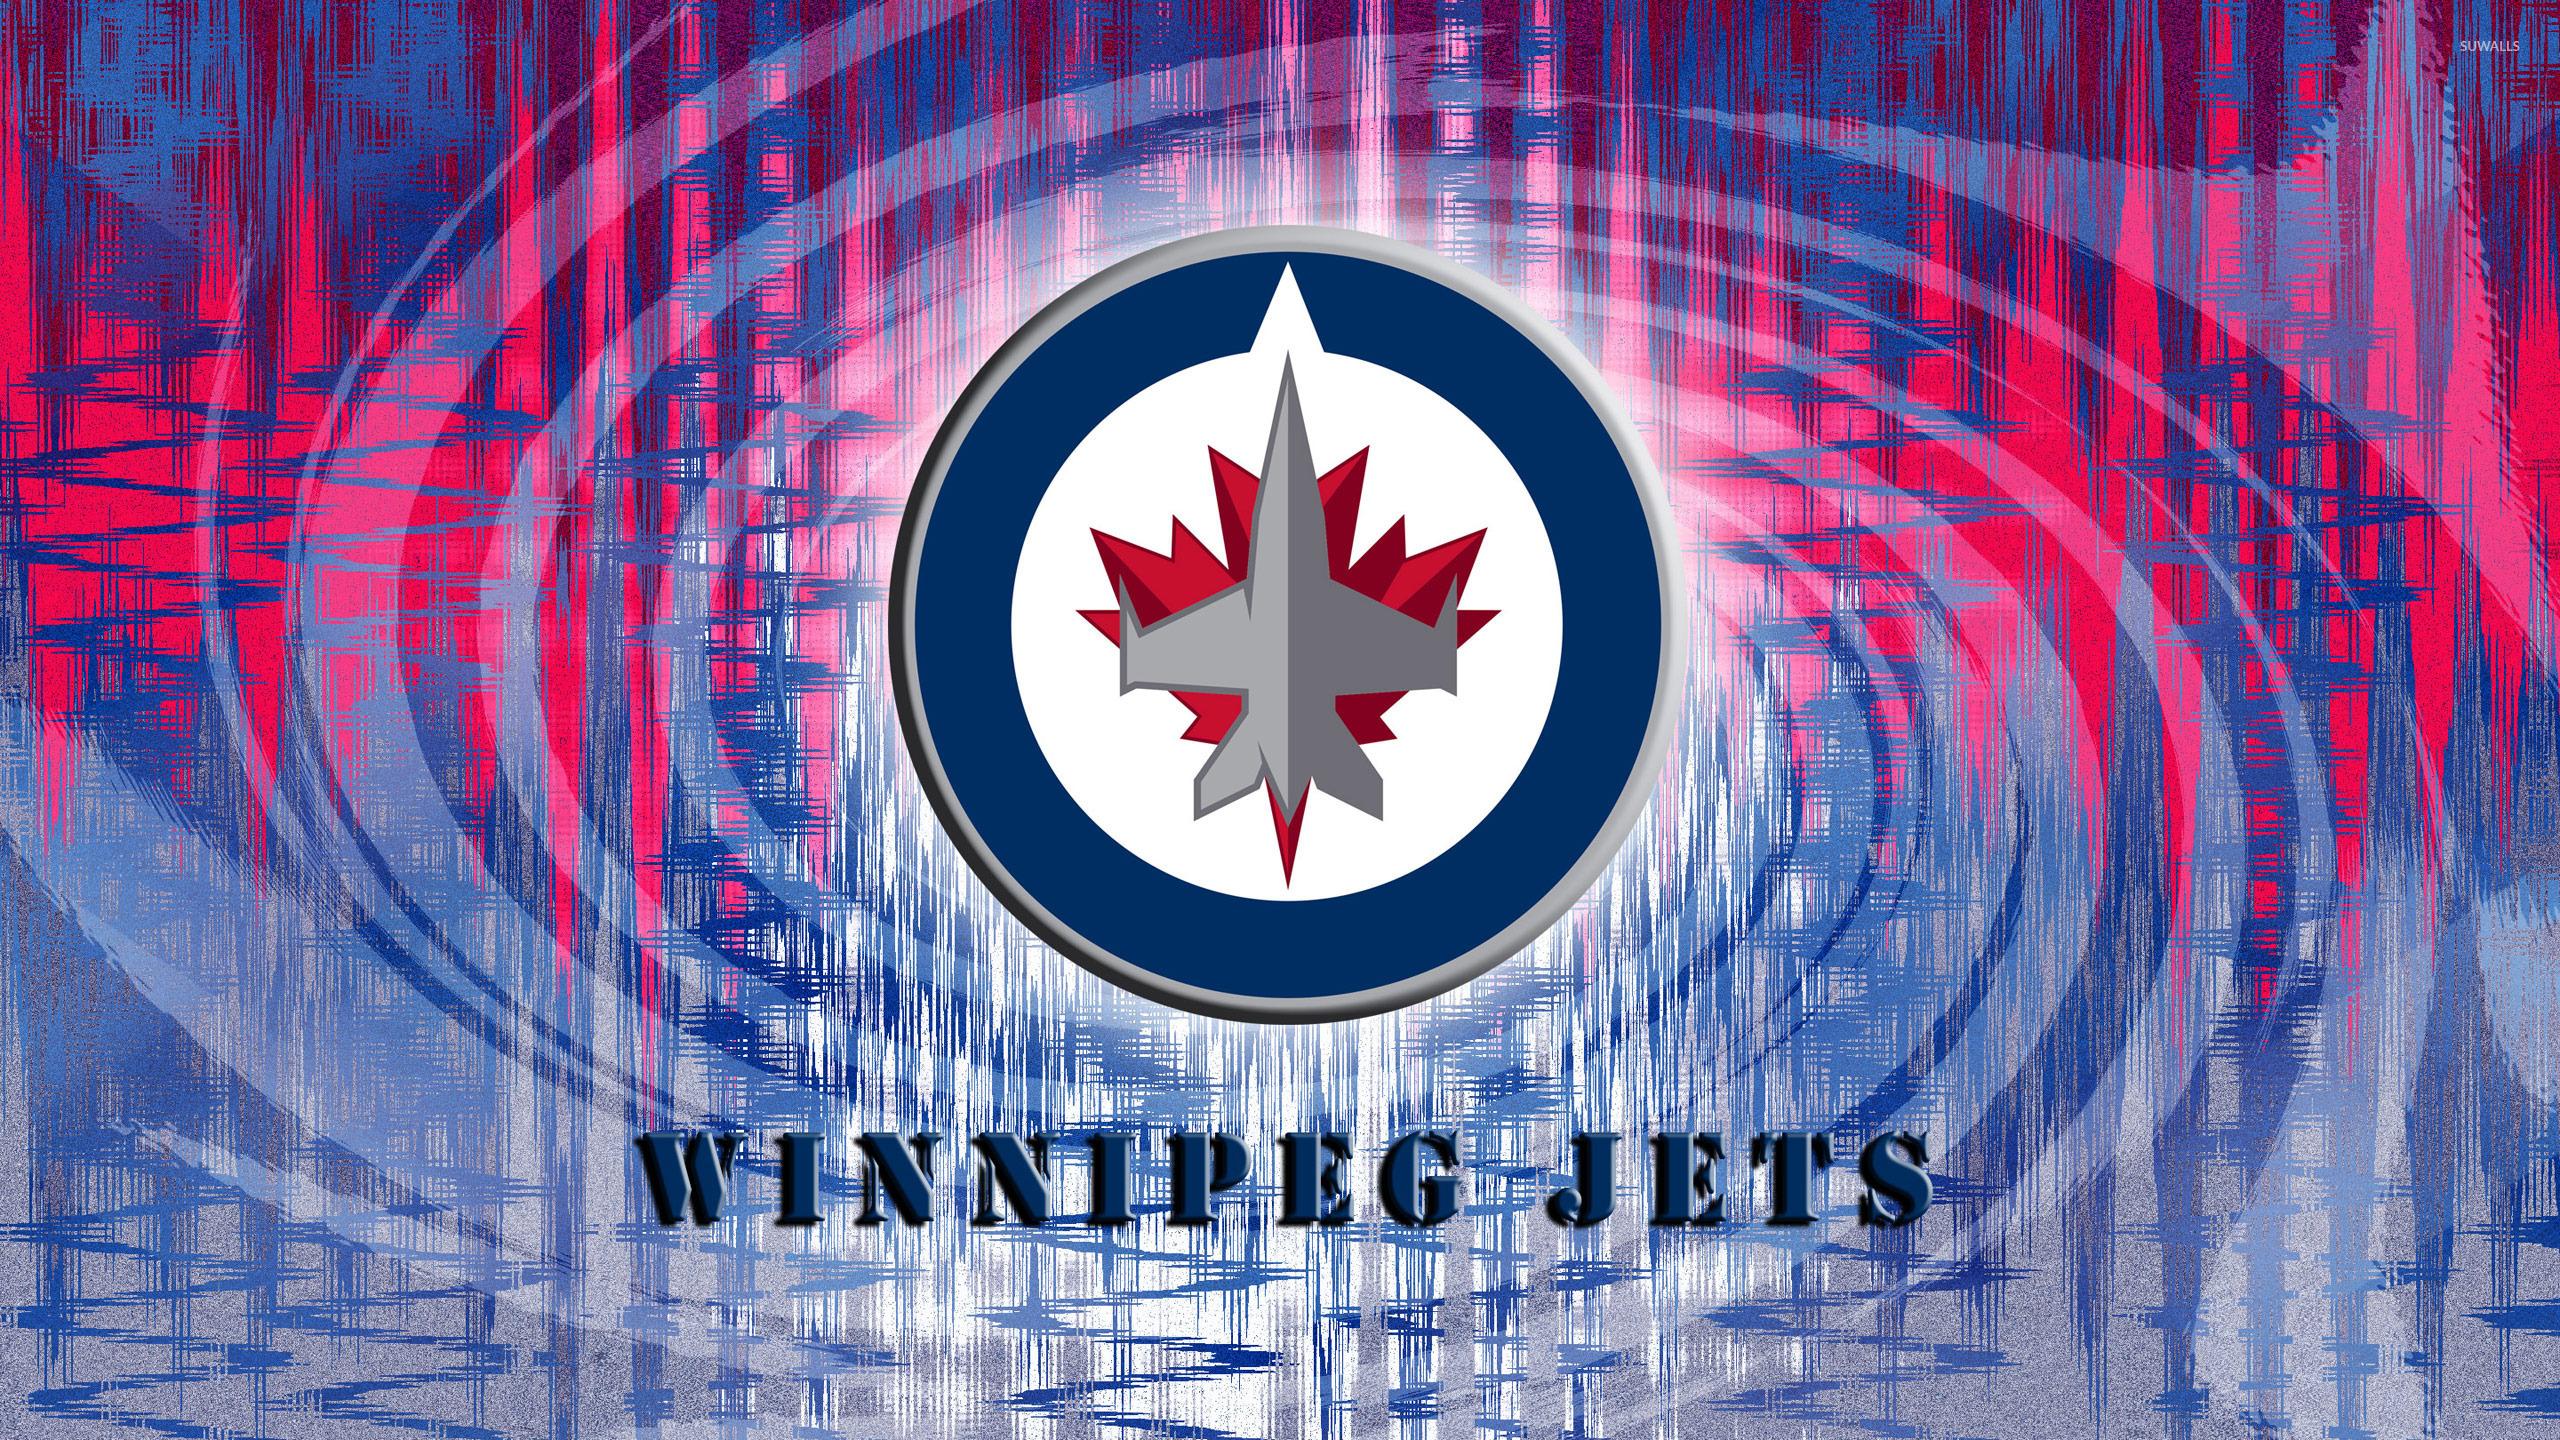 Winnipeg Jets wallpaper   Sport wallpapers   19508 2560x1440